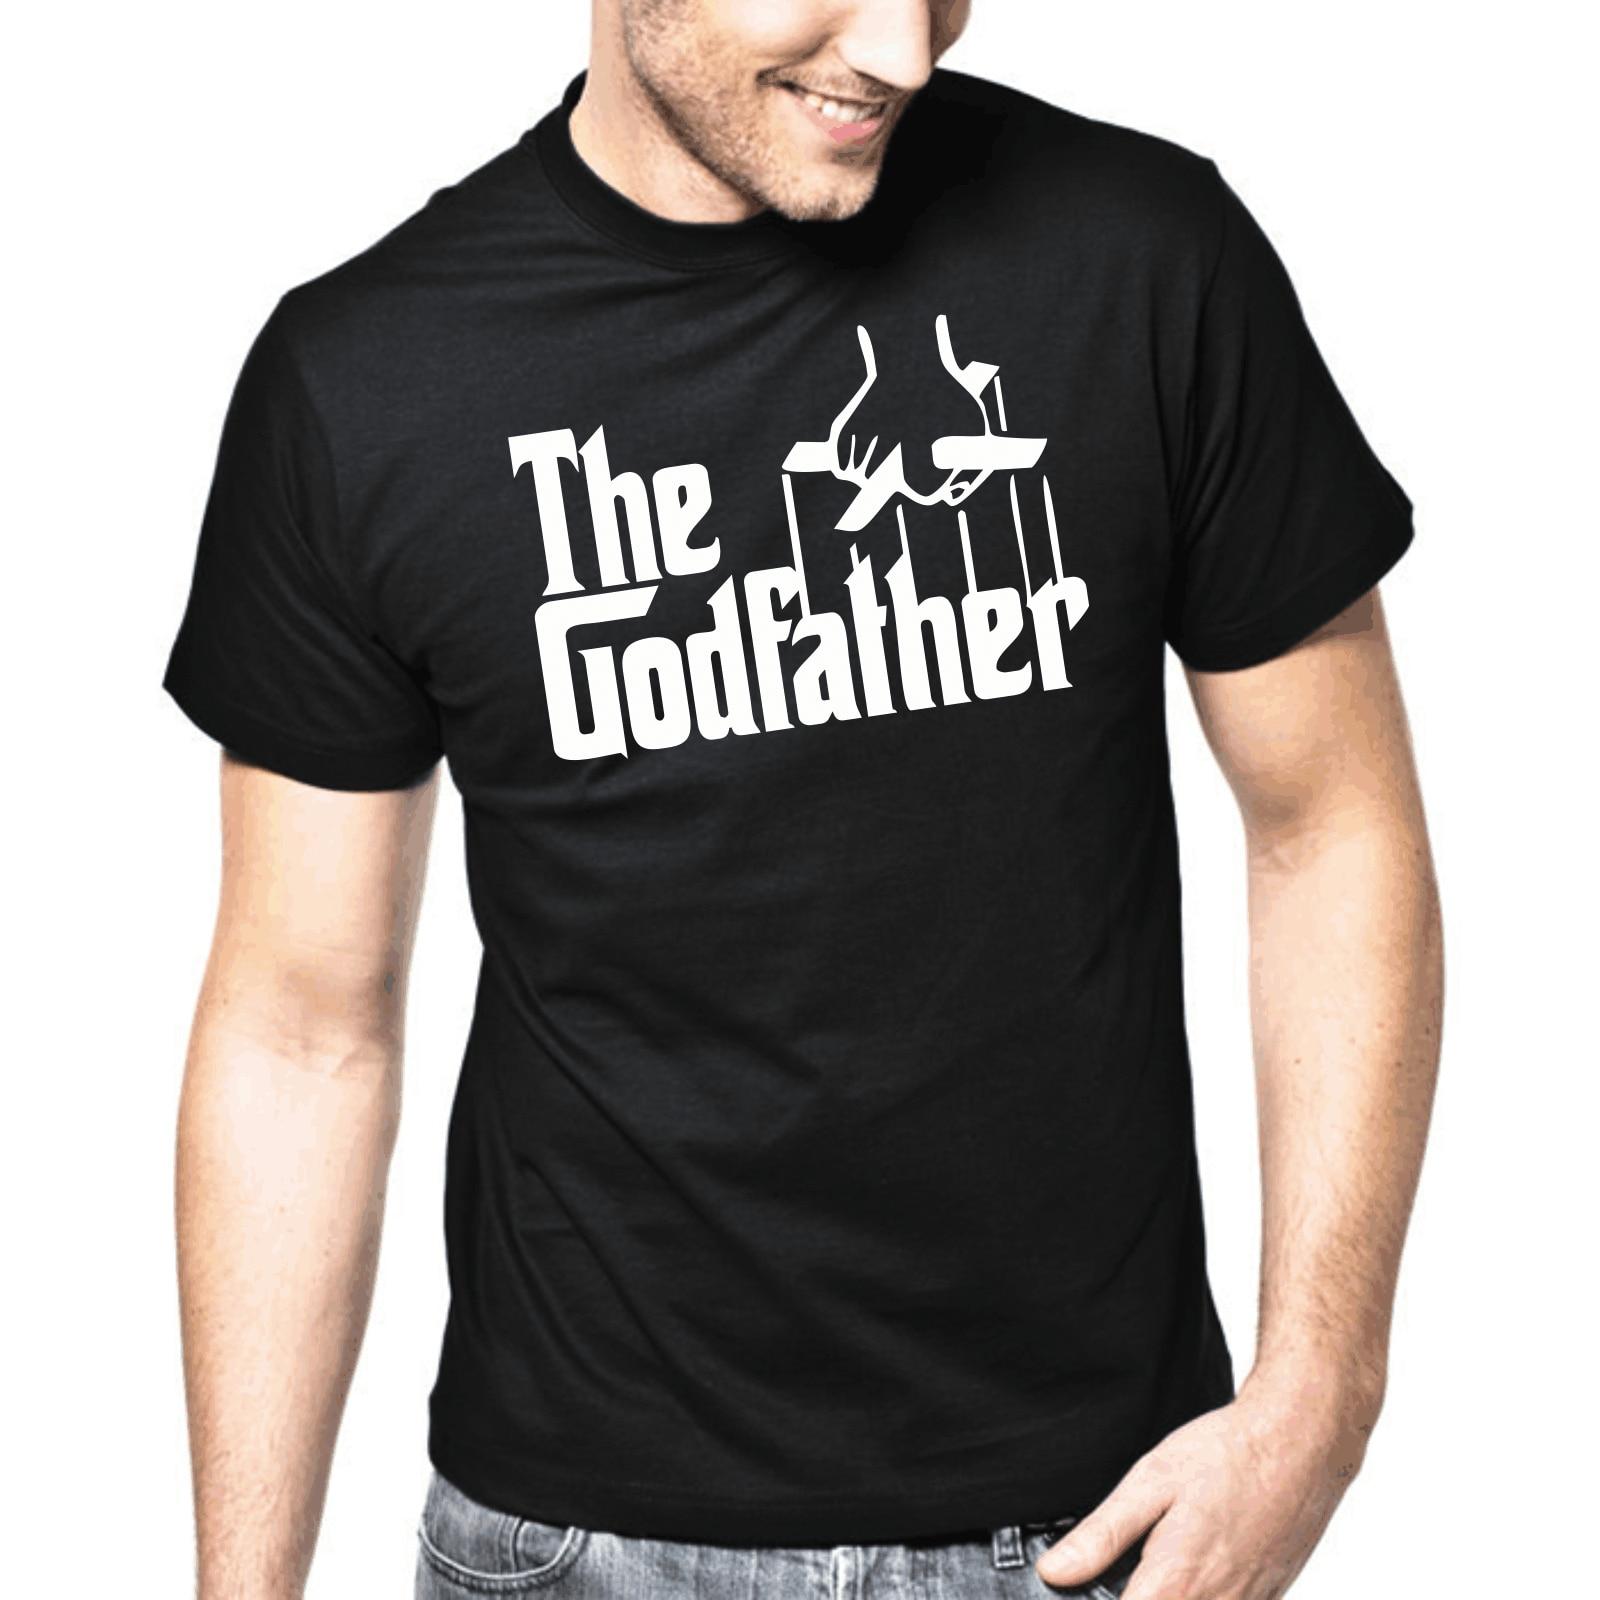 The Godfather  Der Pate  Mafia  Movie  Kult  Retro  Italia  S-3XL T-Shirt MenS T Shirt 2018 Newest